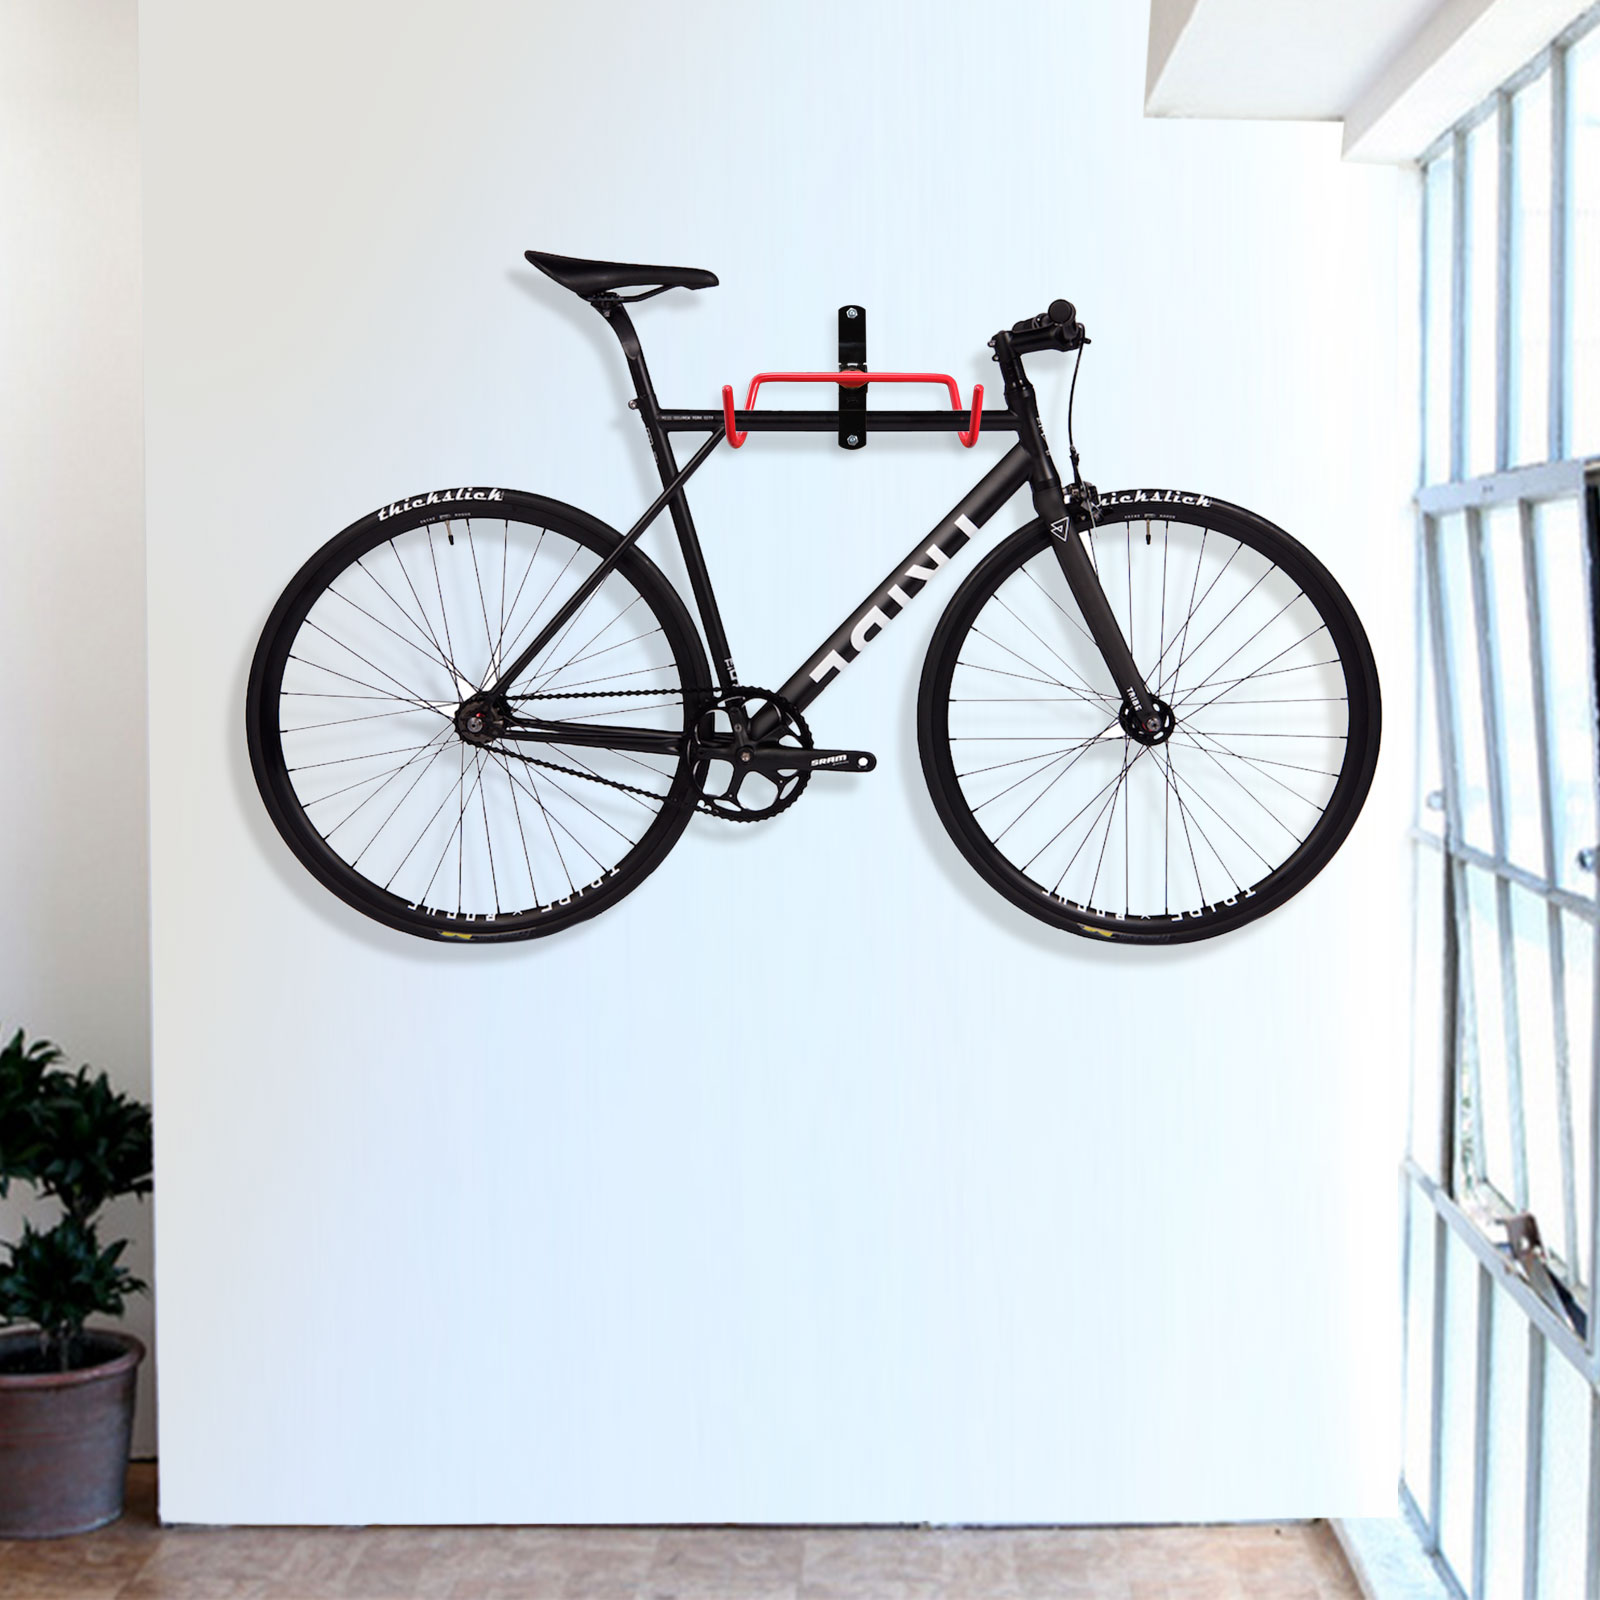 2pcs Bike Wall Mount Hanger Garage Storage Hook Holder